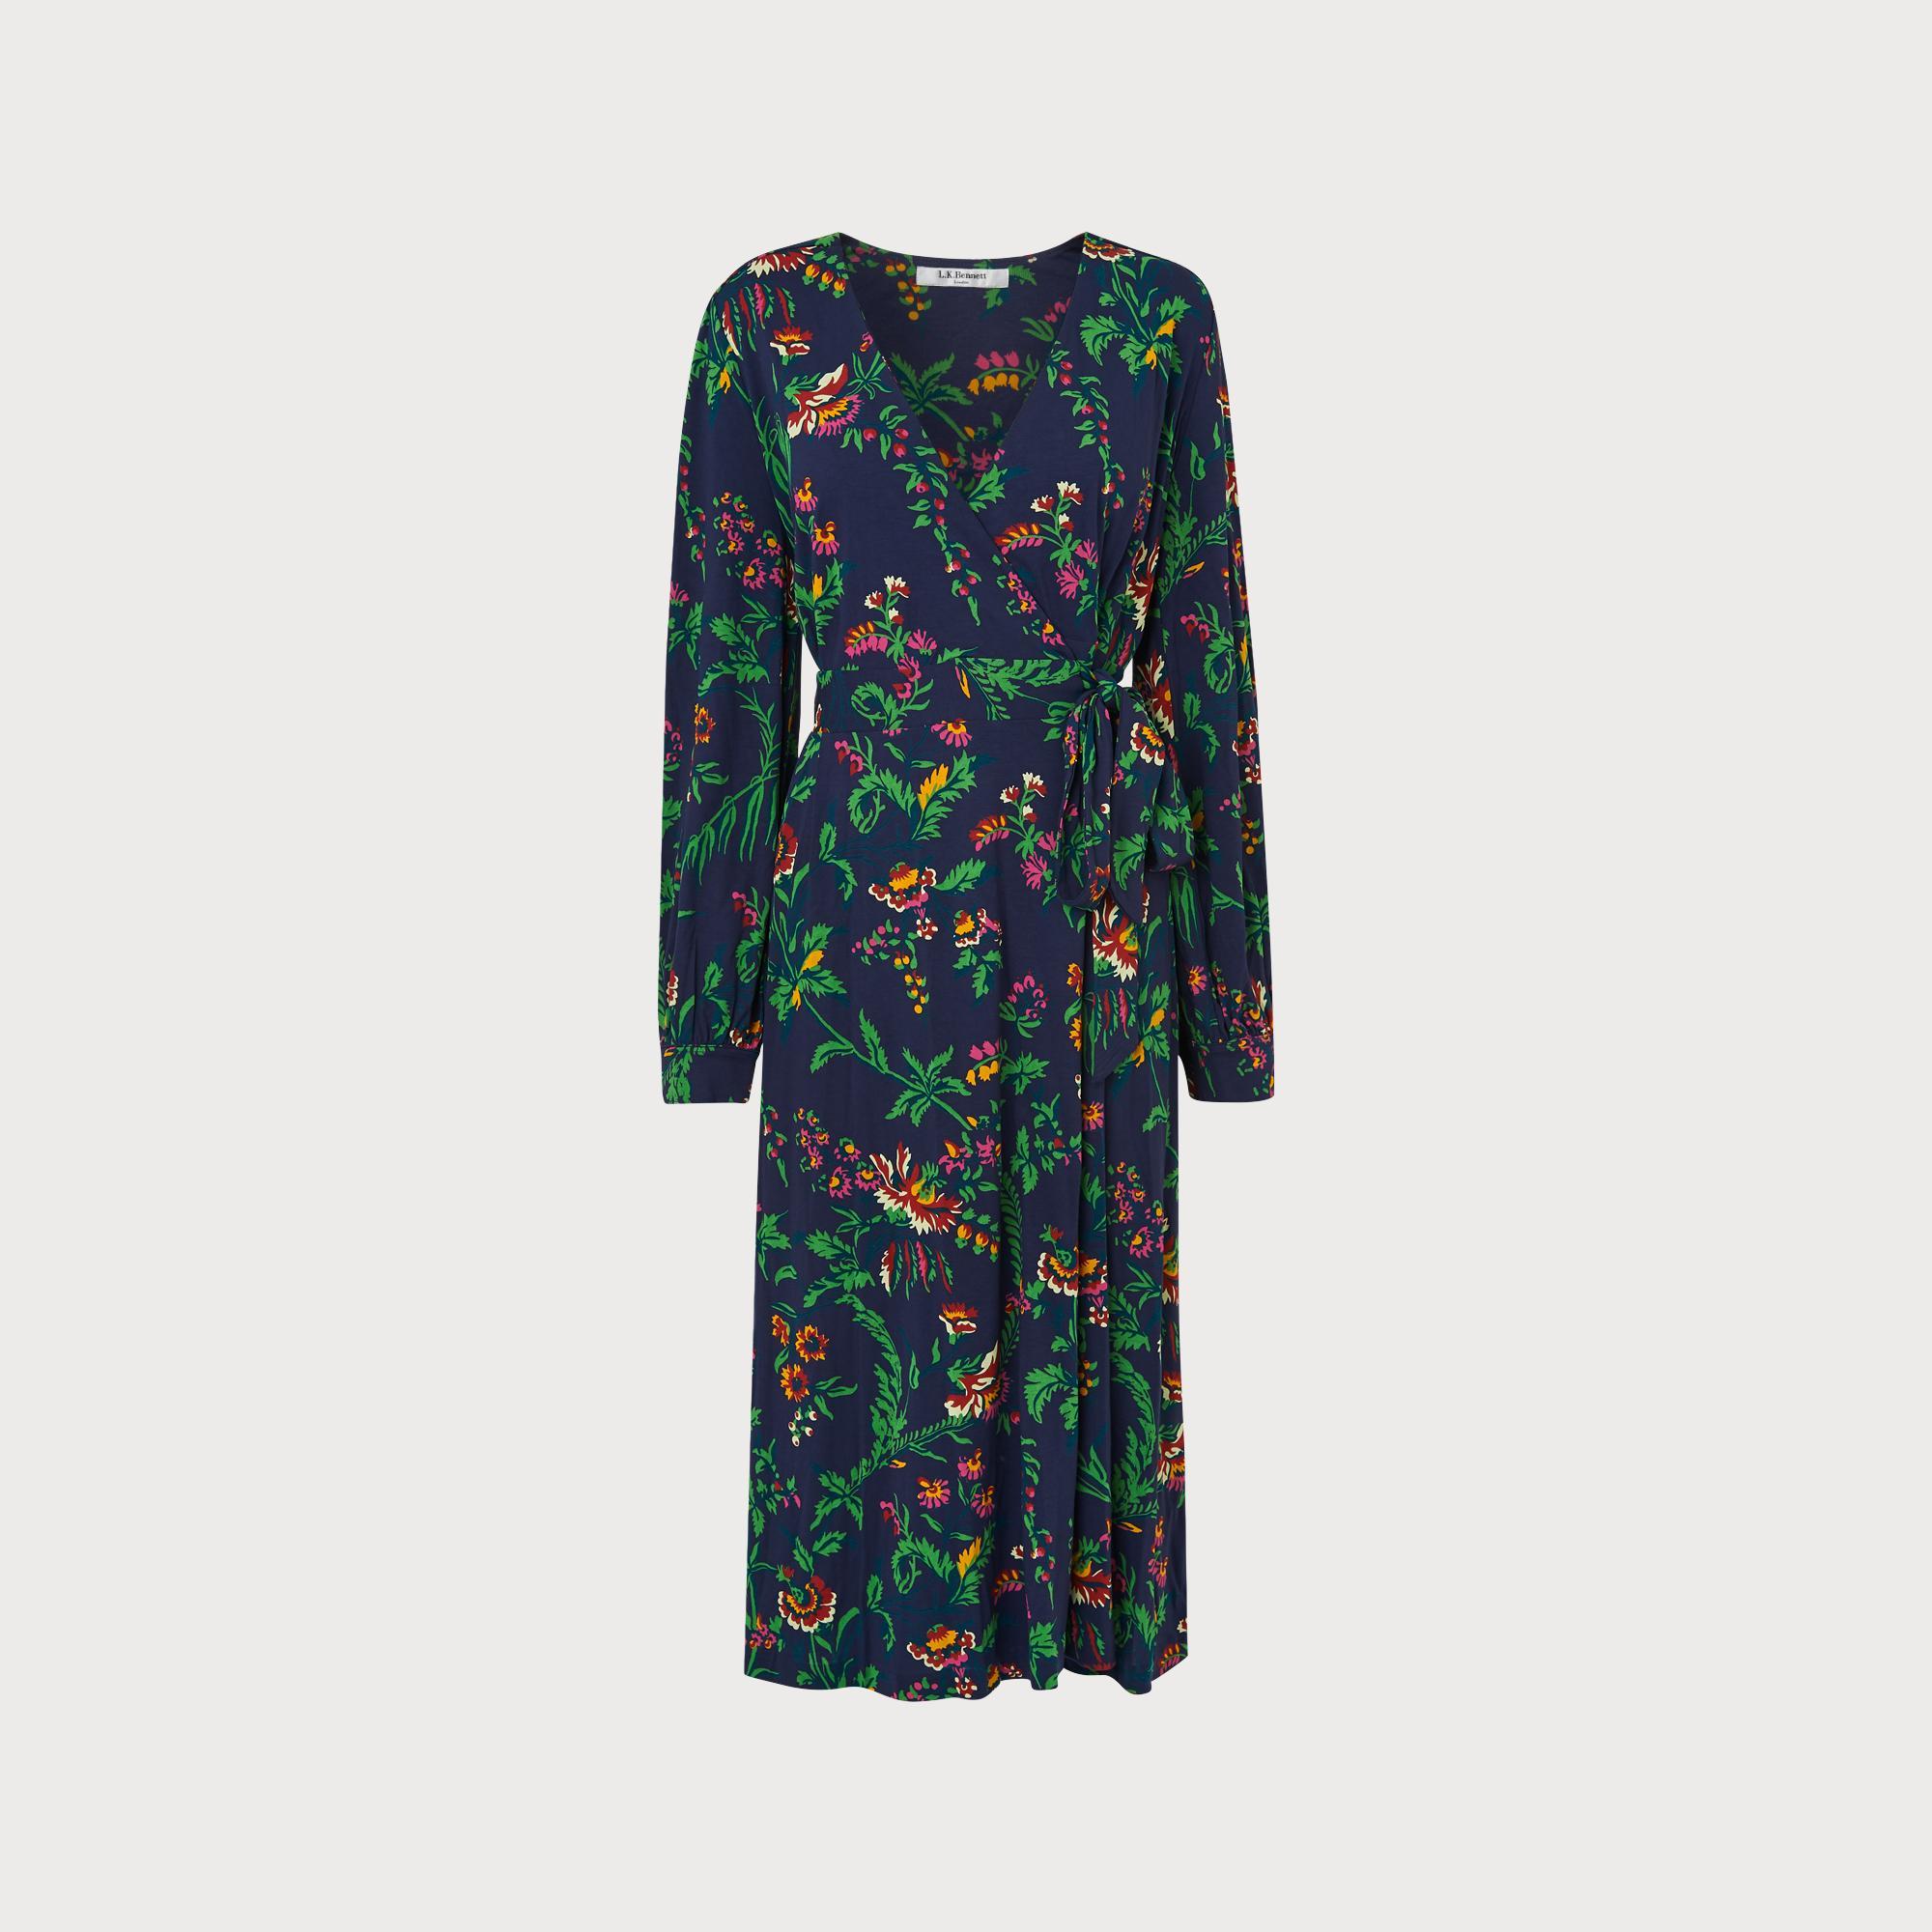 127319f2c4 Ella Navy Wildflower Print Wrap Dress